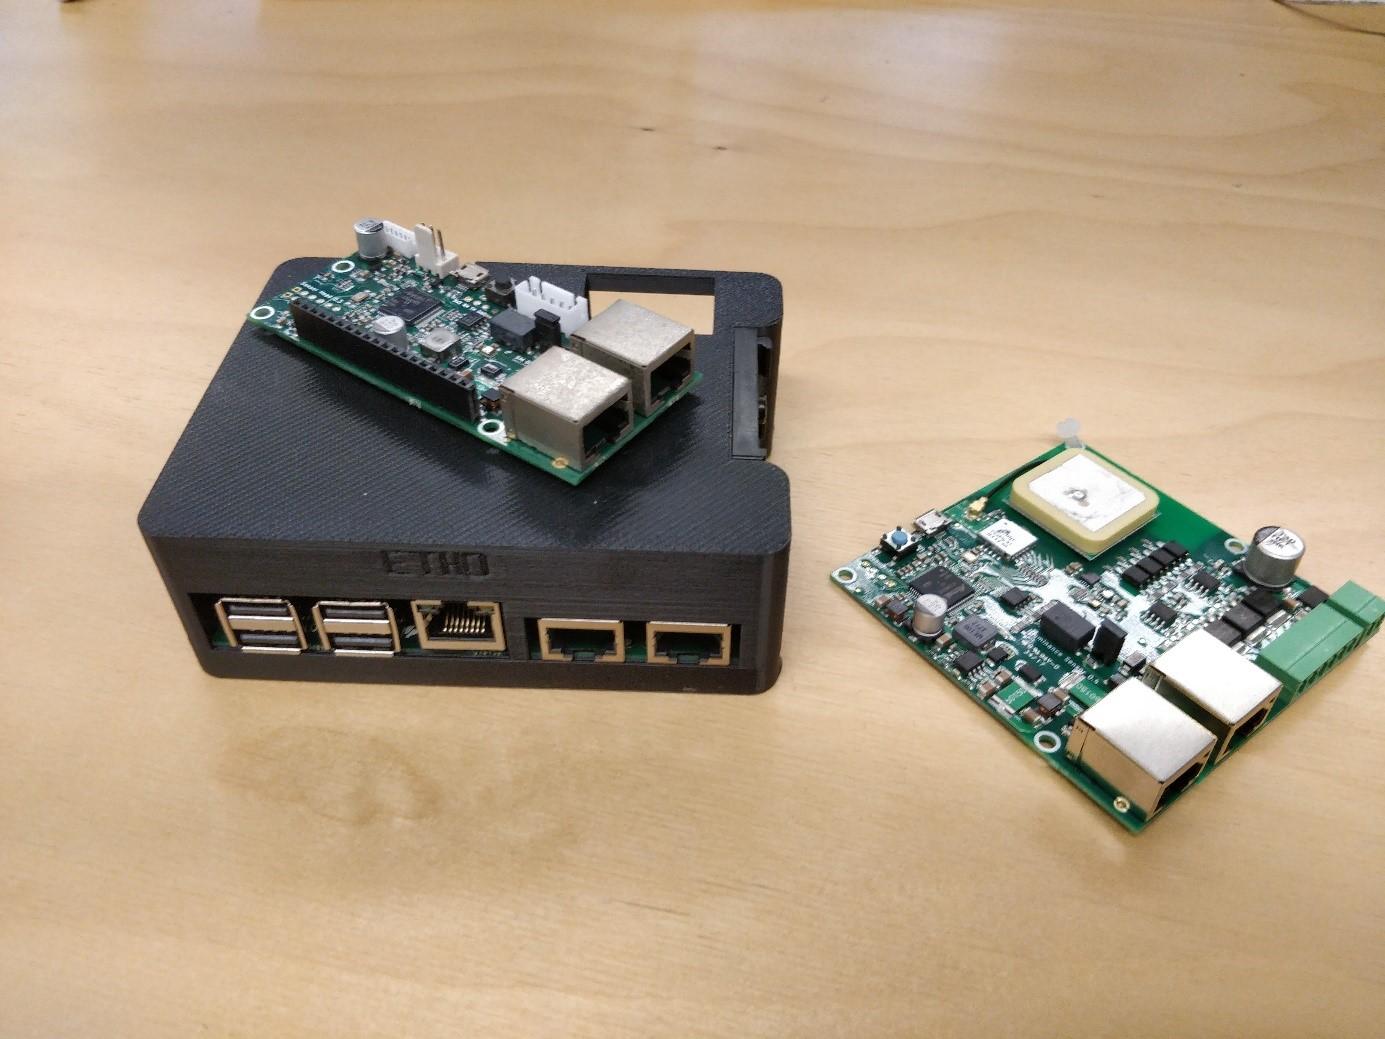 prtg-network-monitor-smght5.jpg